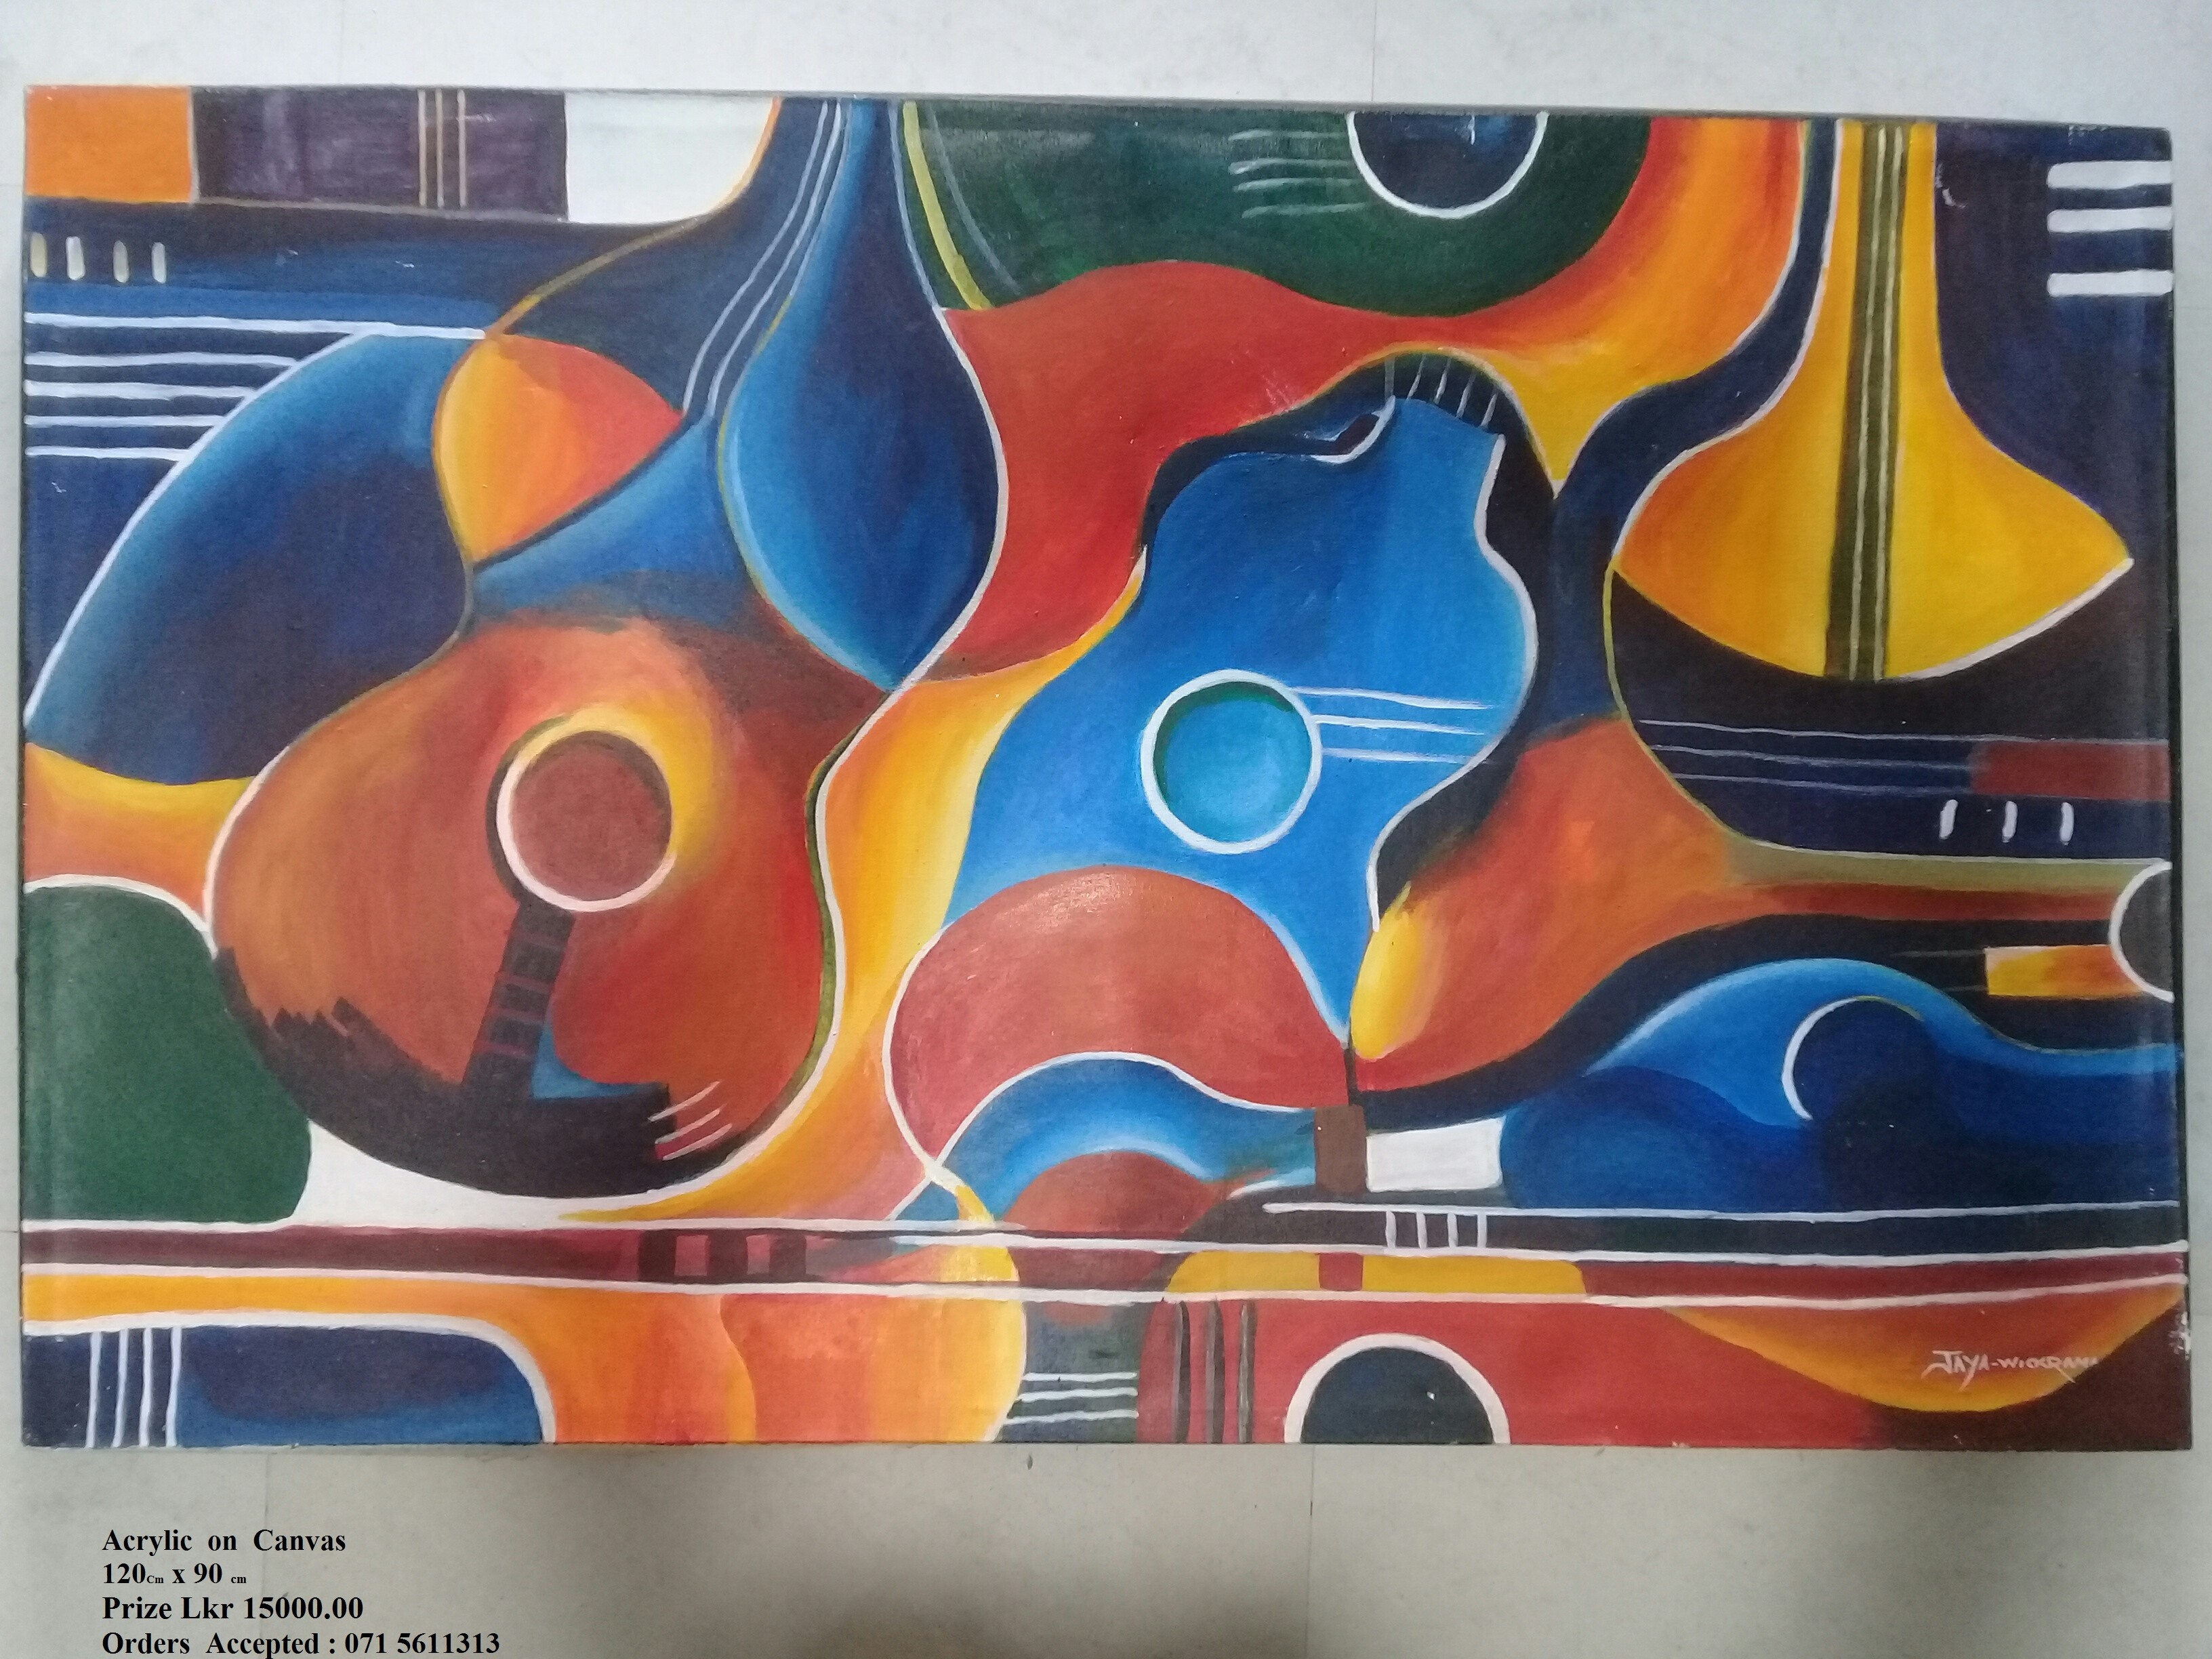 Abstract 2 by Wickramasinghe Arachchige Jayarathna